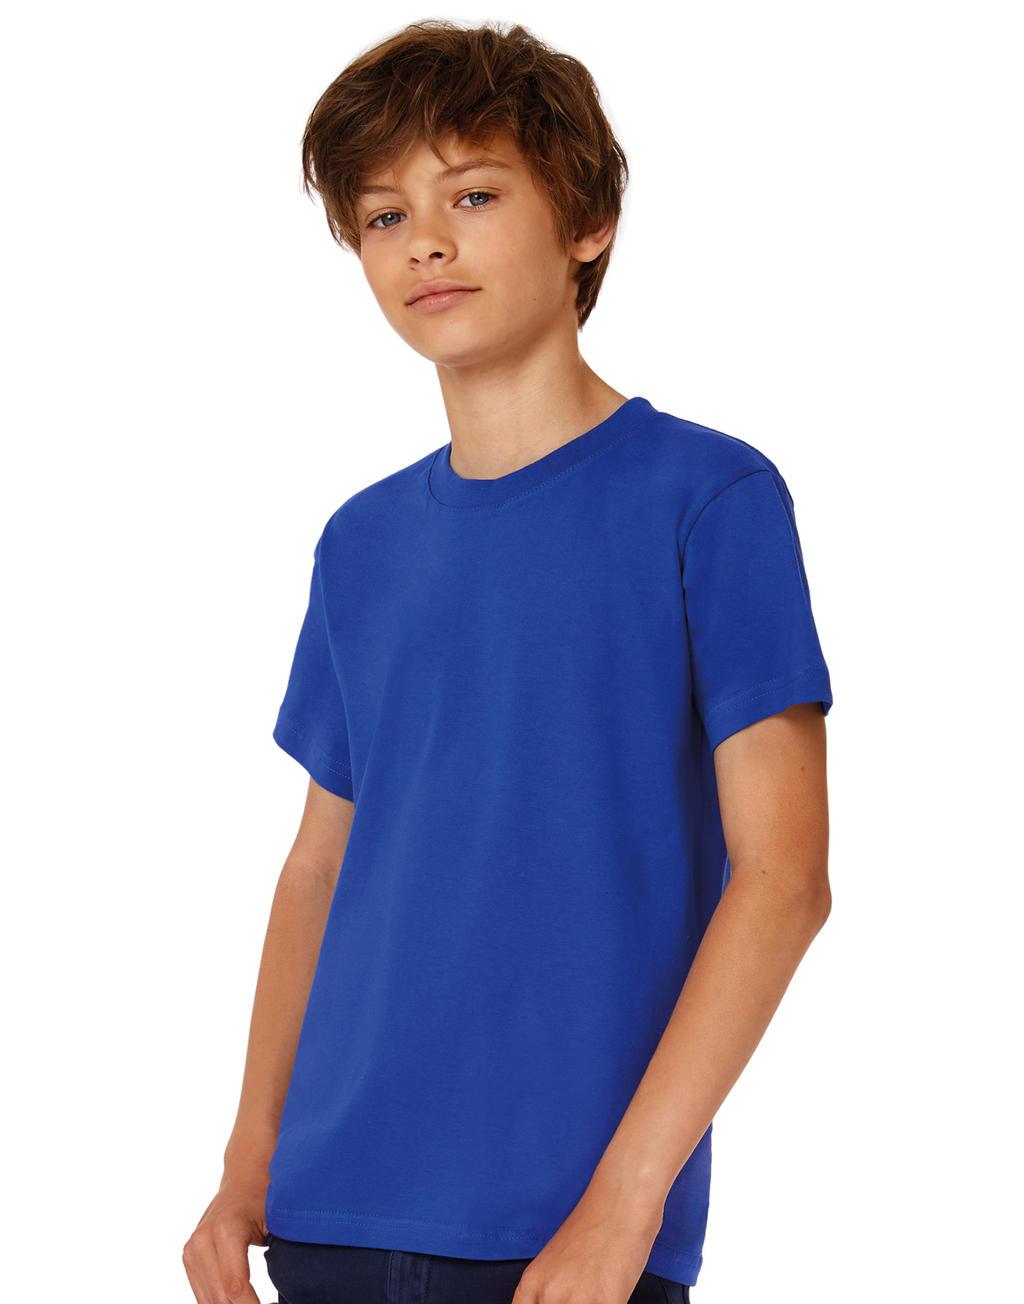 49d8f31cd Camiseta niño Exact 190 kids T-Shirt